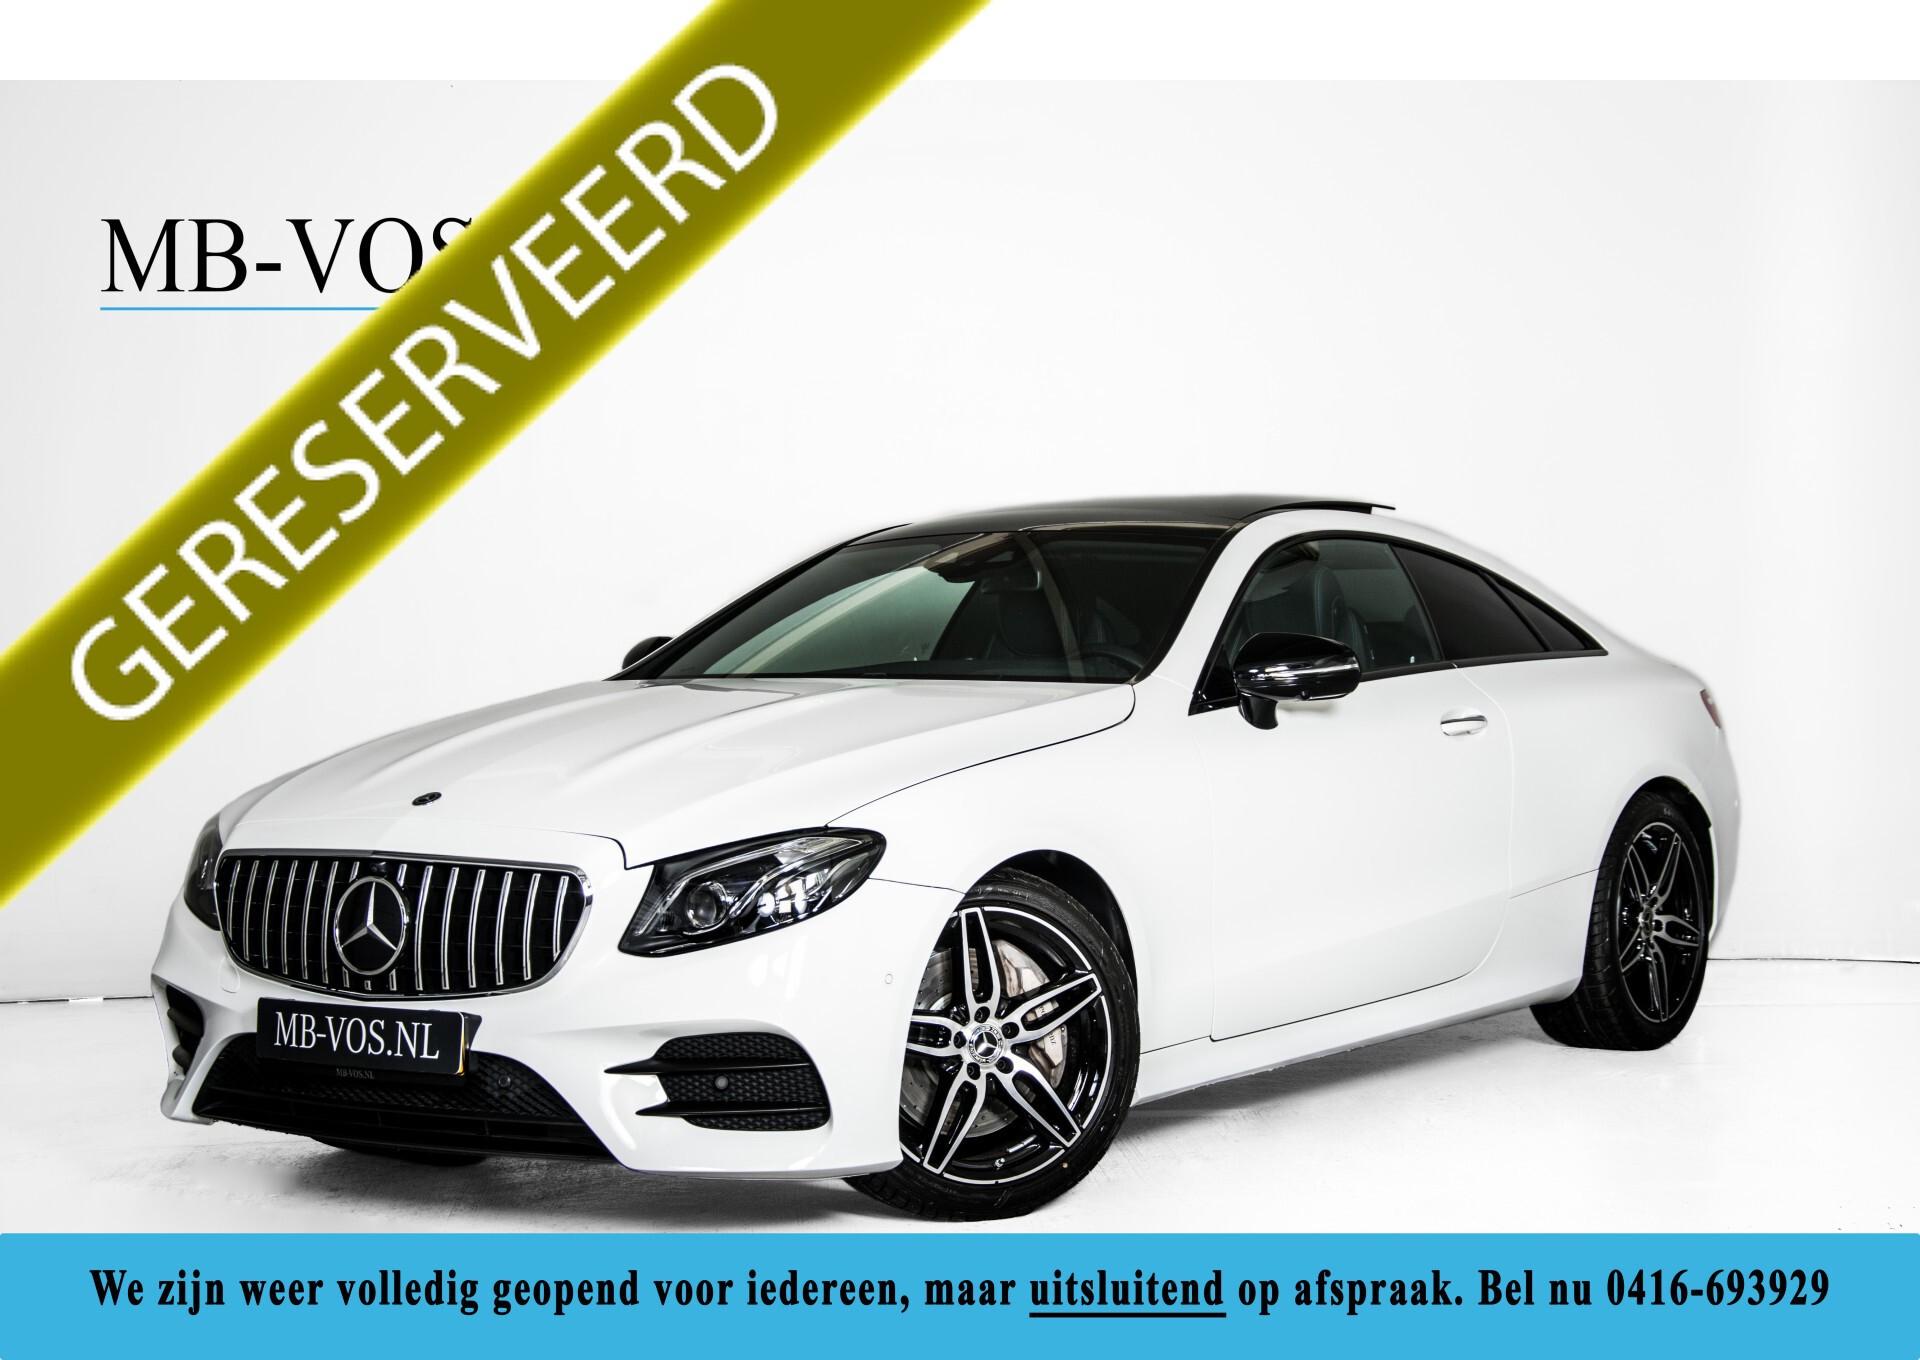 Mercedes-Benz E-Klasse Coupé 300 AMG Panorama/Rij-assist/Keyless/Massage/Memory/HUD/Standkachel/Night Aut9 Foto 1